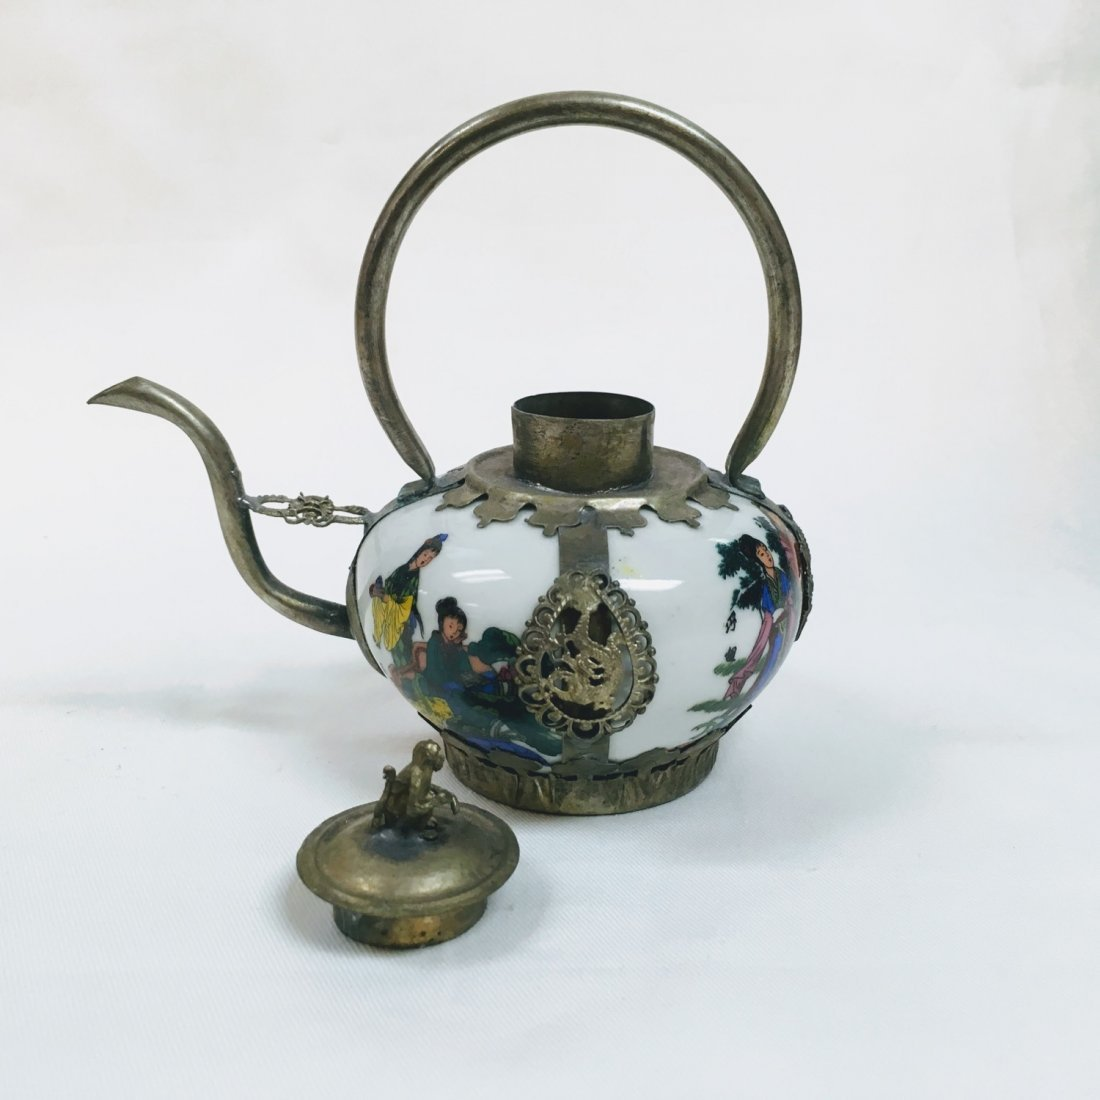 Chinese Vintage Porcelain & Metal Teapot - 7